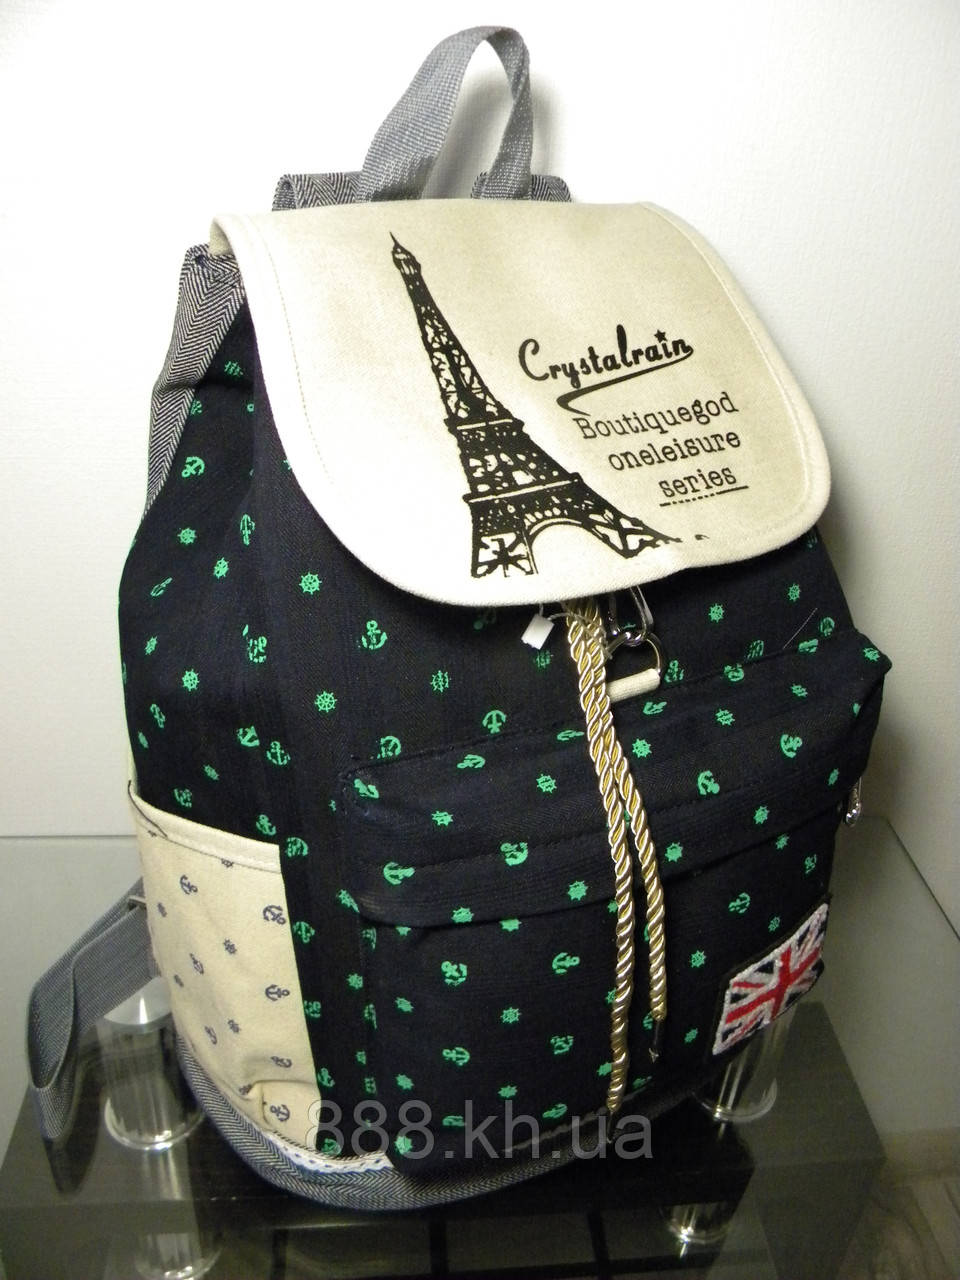 Жіночі рюкзак, городской рюкзак якаря зеленый.